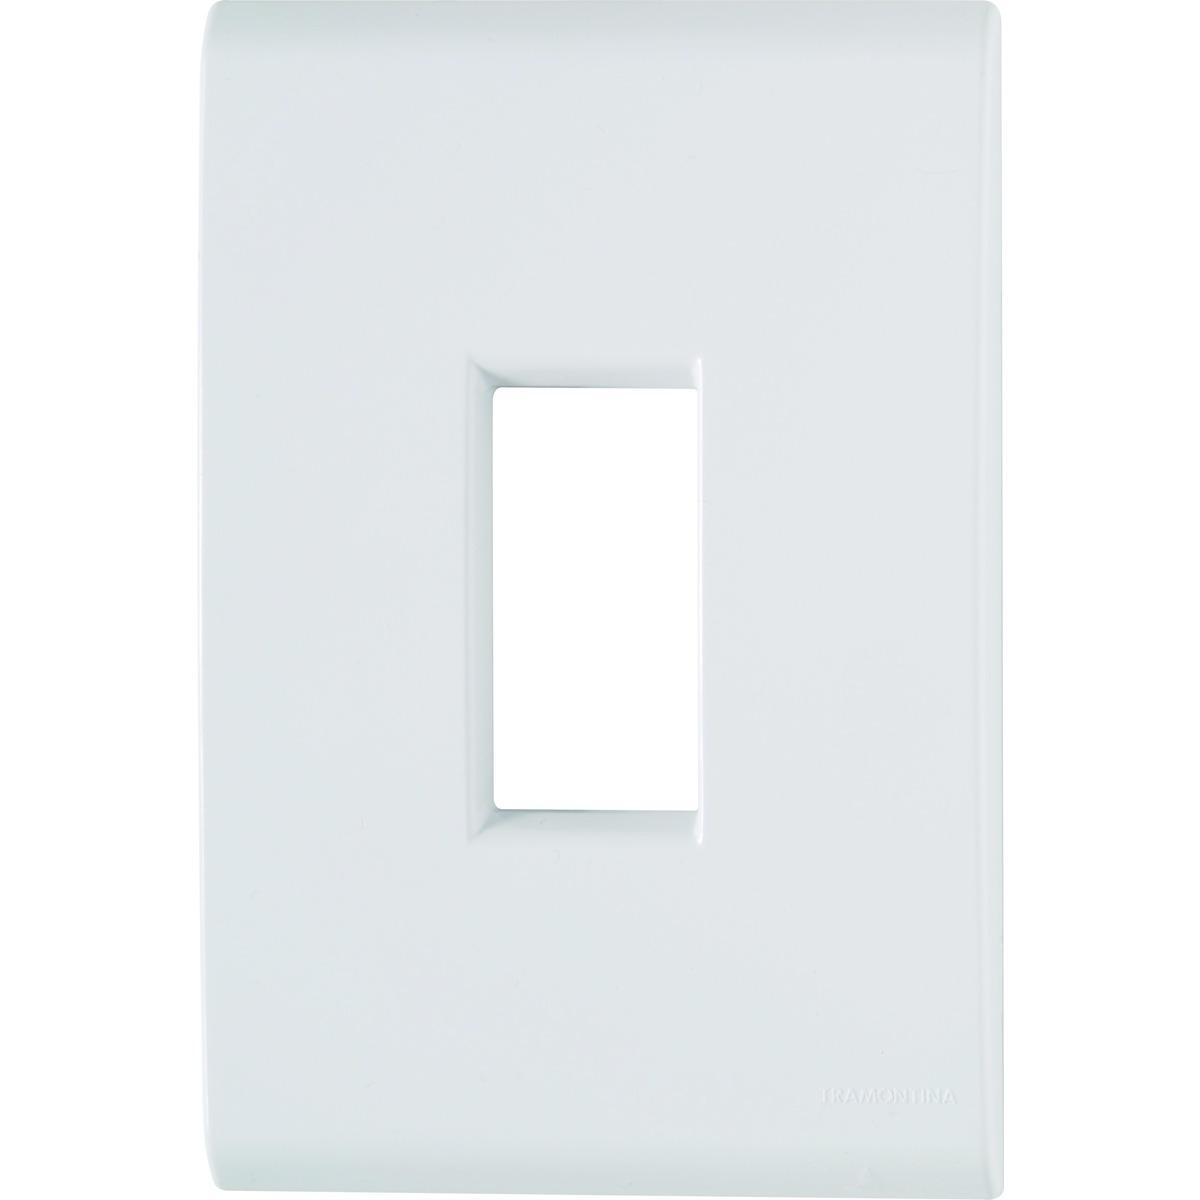 Placa 1 posto vertical - 4x2 - Tramontina